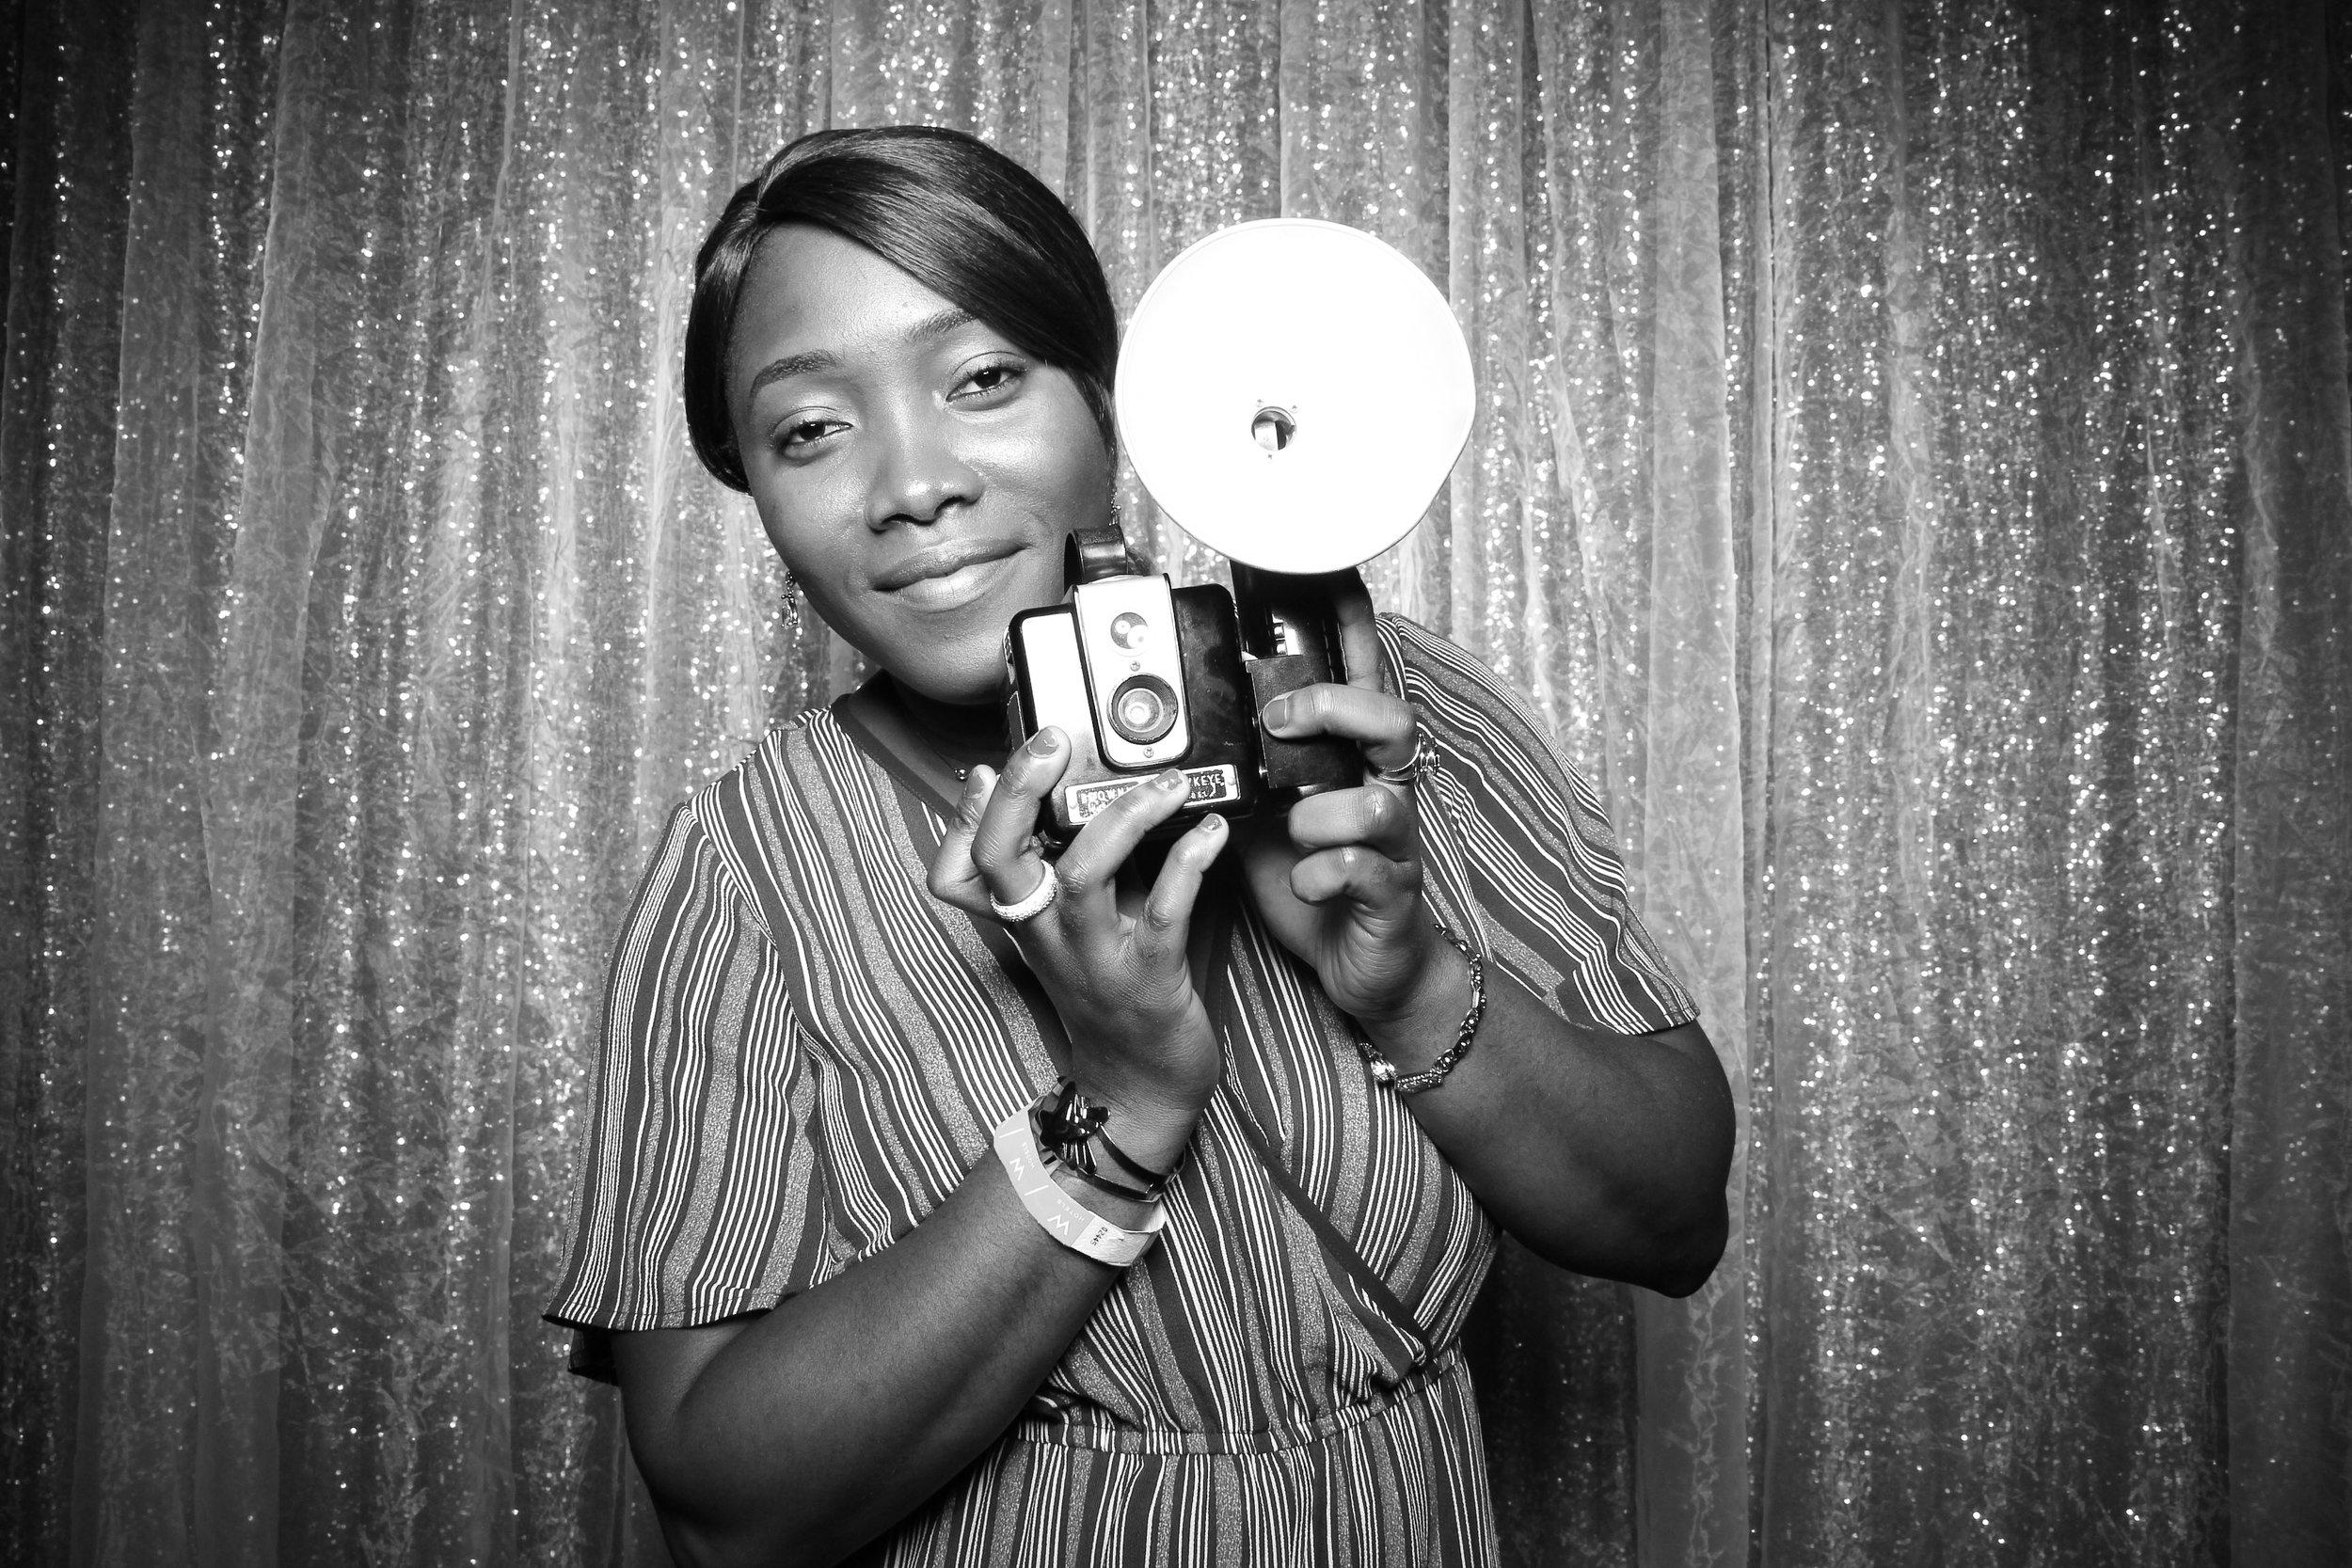 Chicago_Vintage_Wedding_Photobooth_W_Lakeshore_Hotel_24.jpg